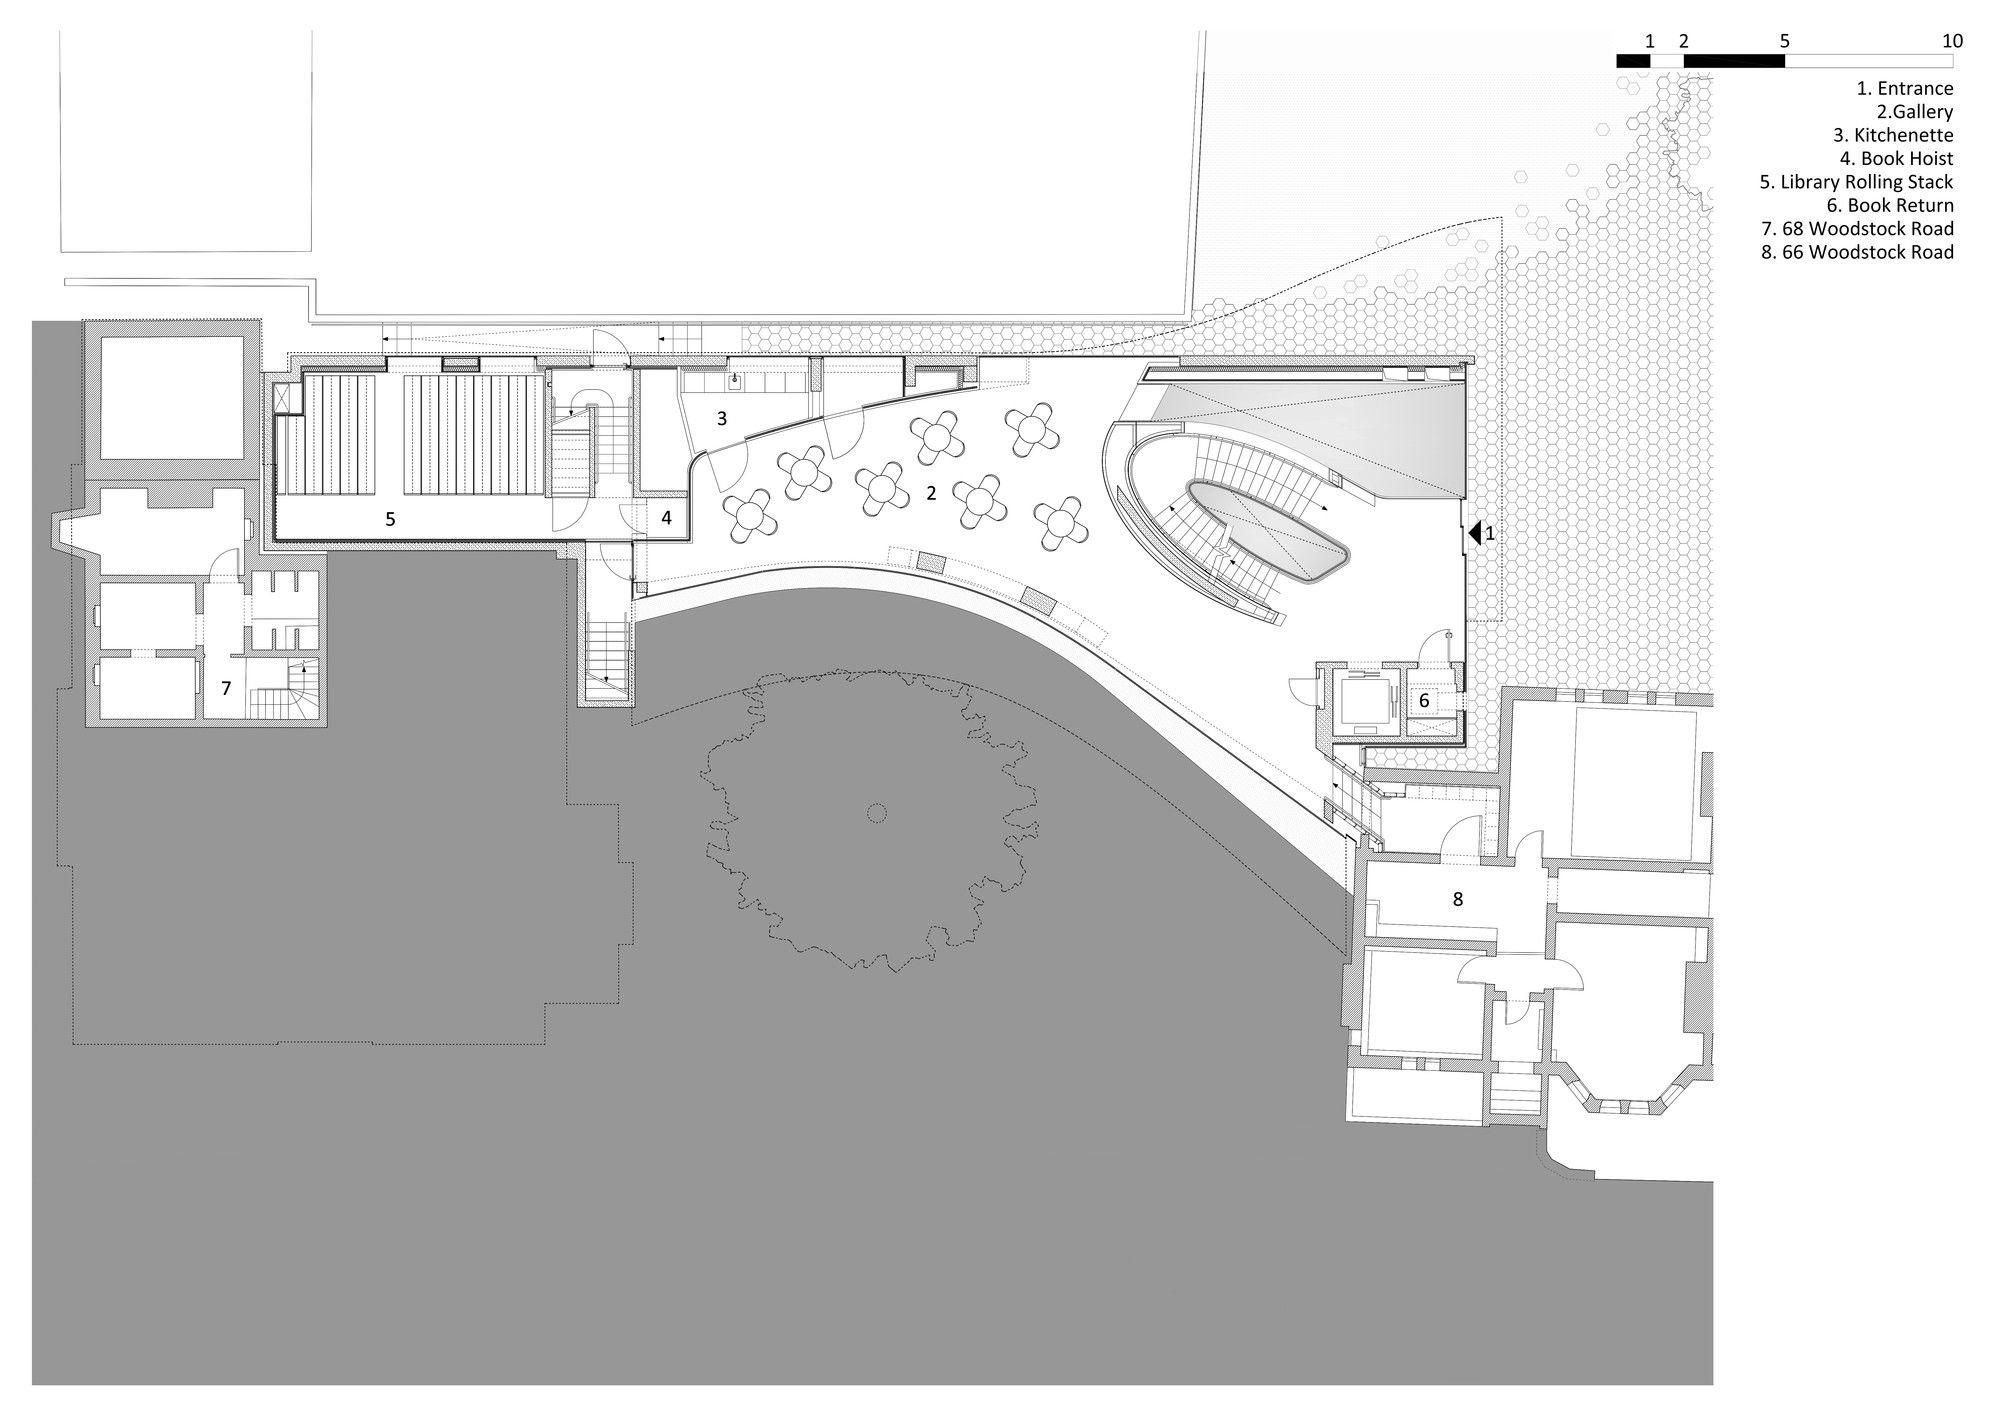 Gallery - The Investcorp Building / Zaha Hadid Architects - 30